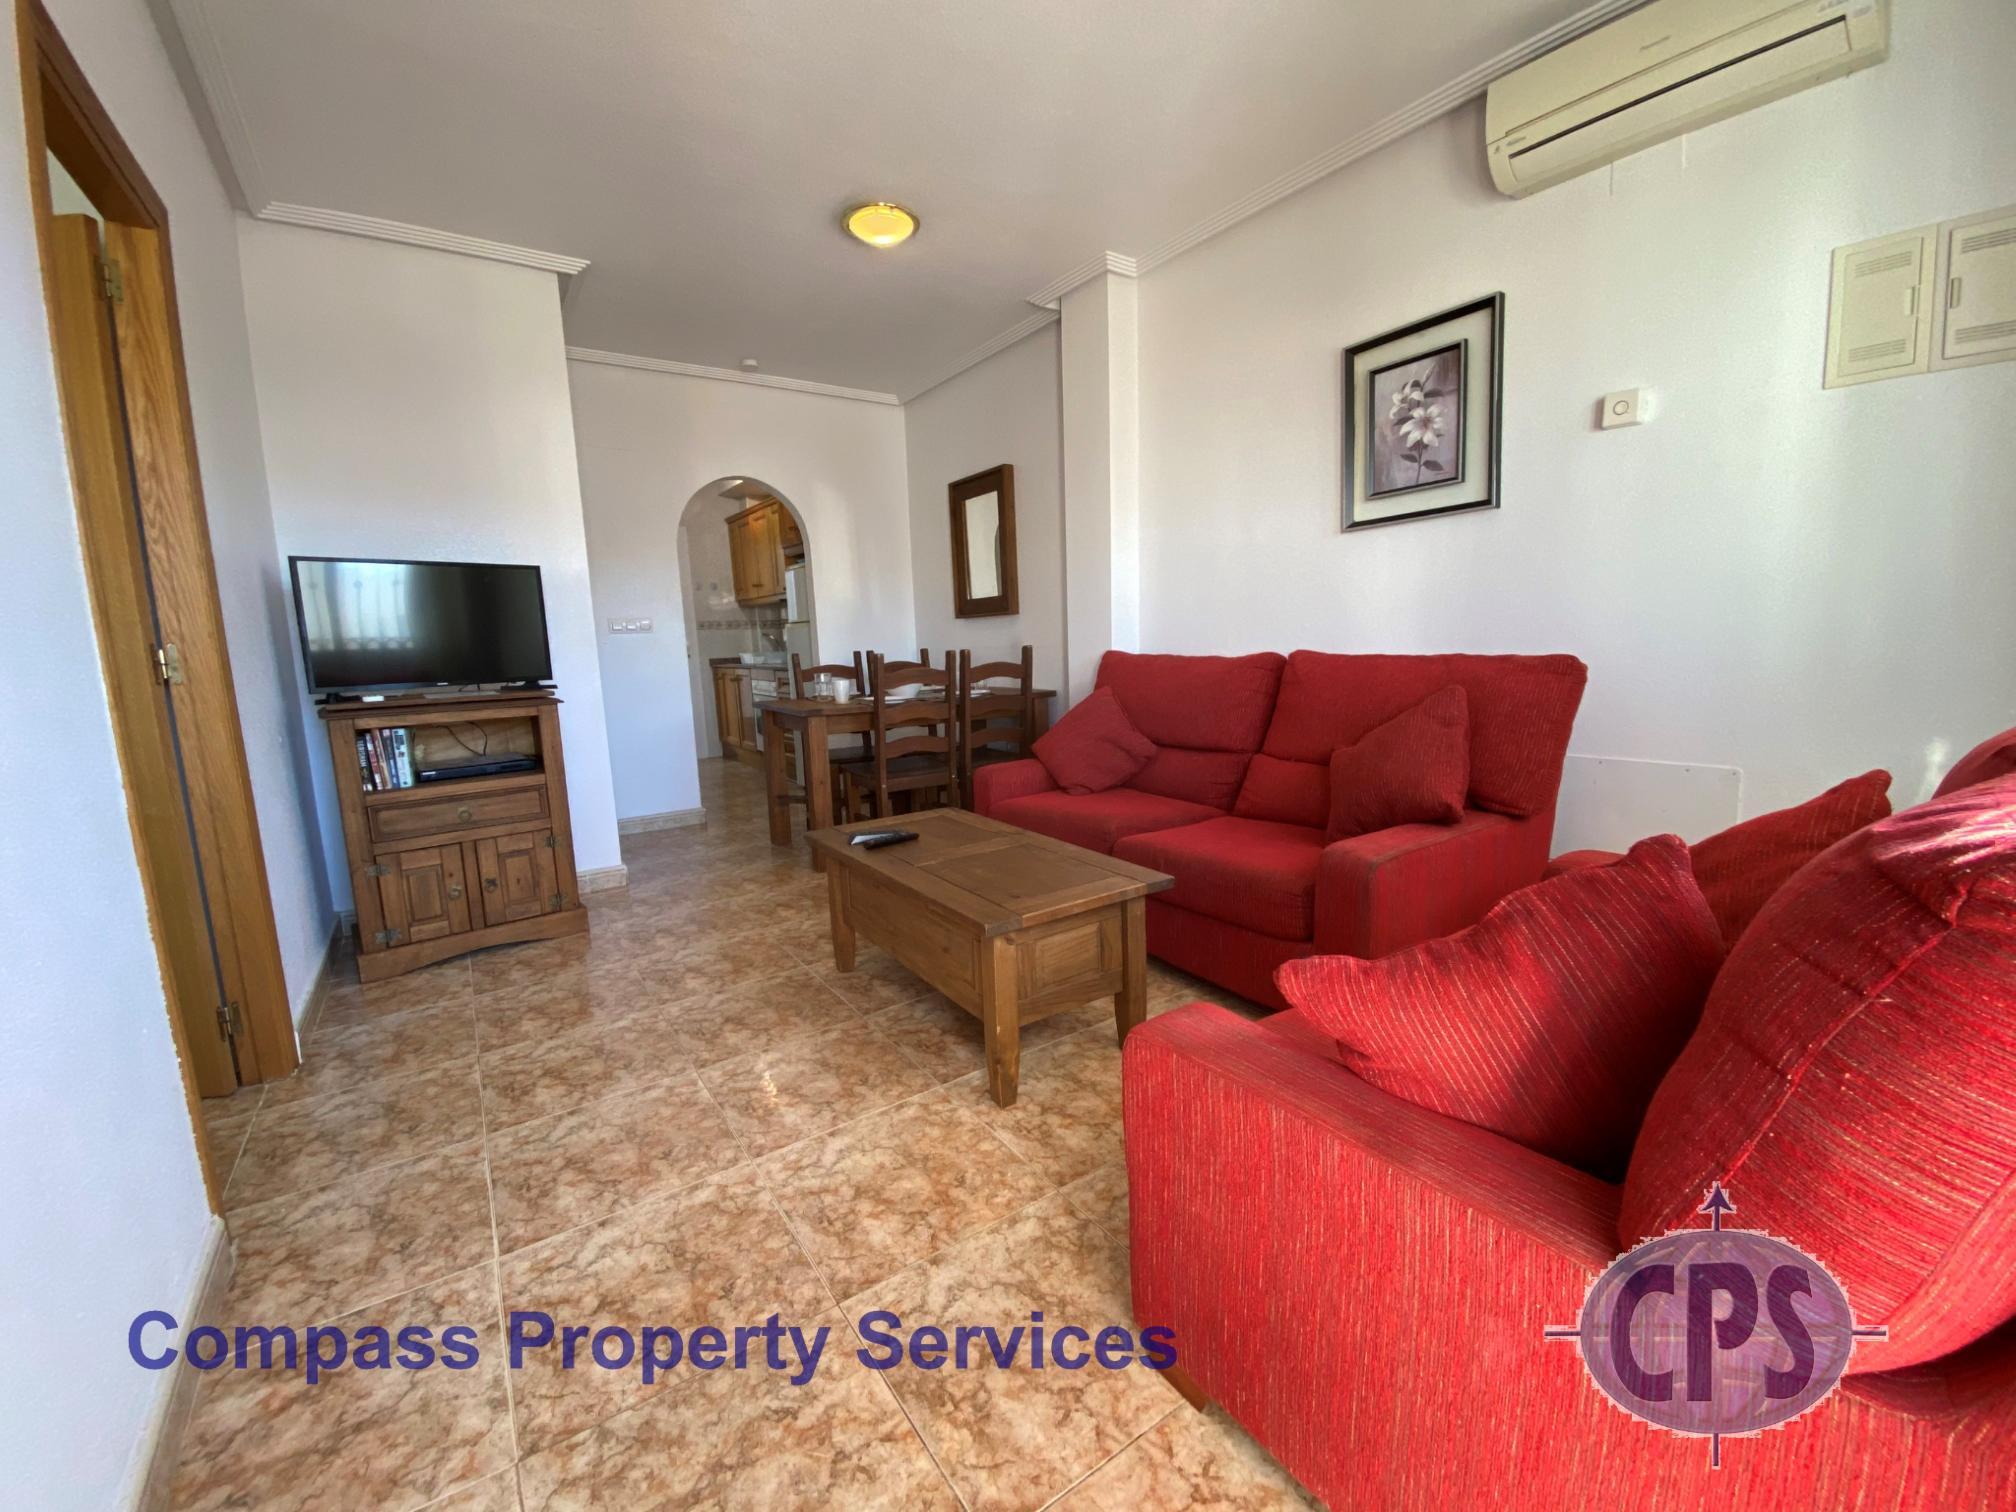 Apartment La Cinuelica R3 1st flr apt overlooking pool l149 photo 28556785